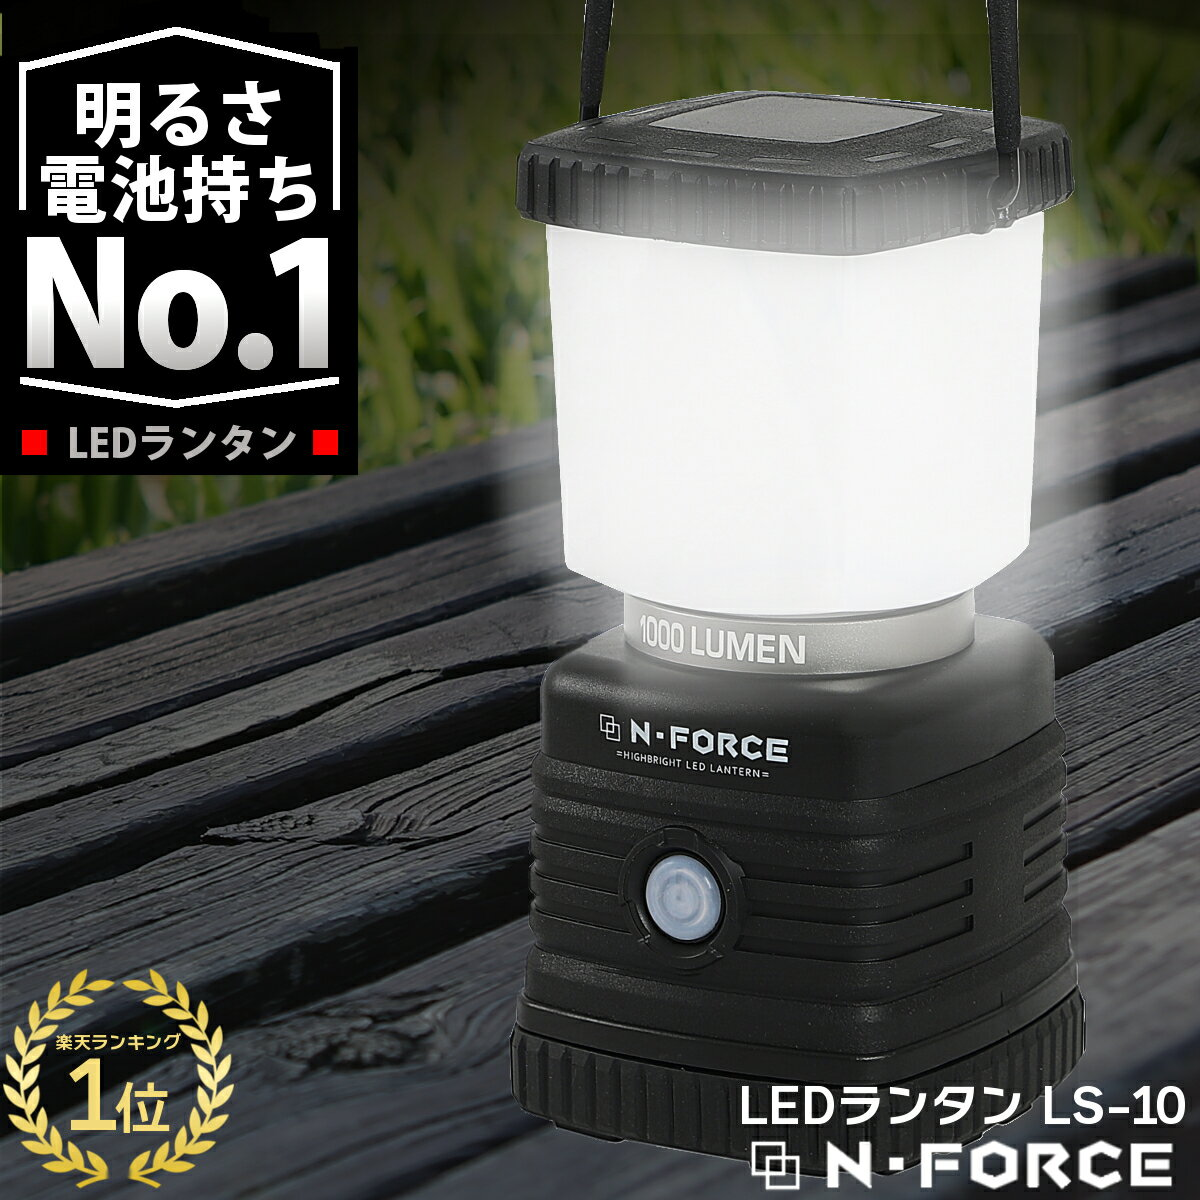 CORVETTE『エヌフォース電池式LEDランタン(LS-10)』